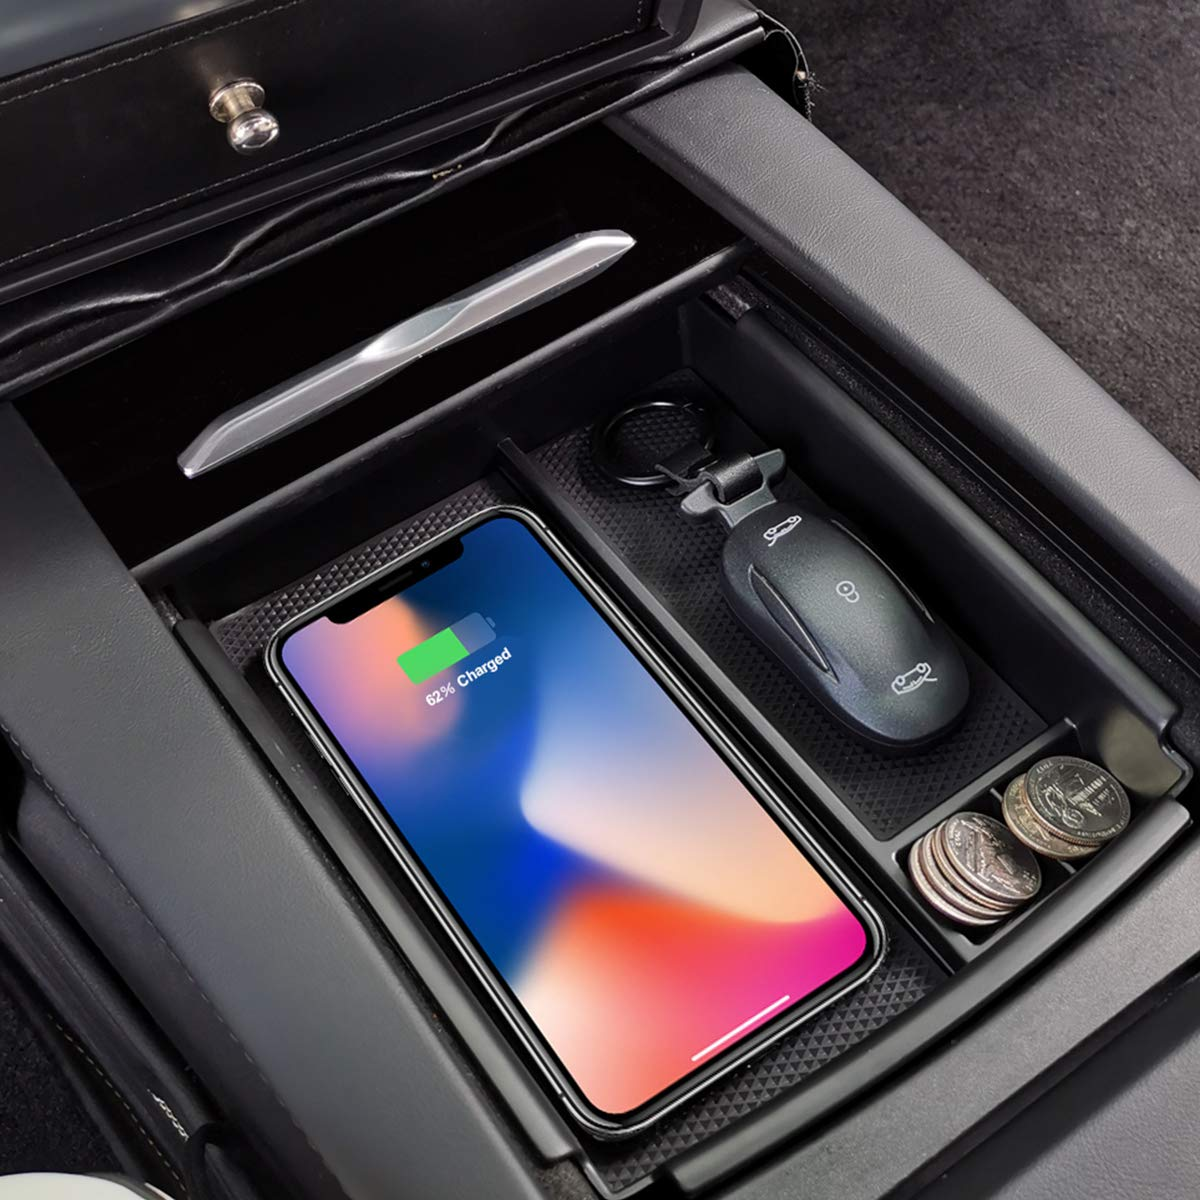 LFOTPP Custom Fit for Ford Escape/2020 Car Center Console Organizer Tray Glove Box Sunglasses Holder,Car Accessories Secondary Storage Box